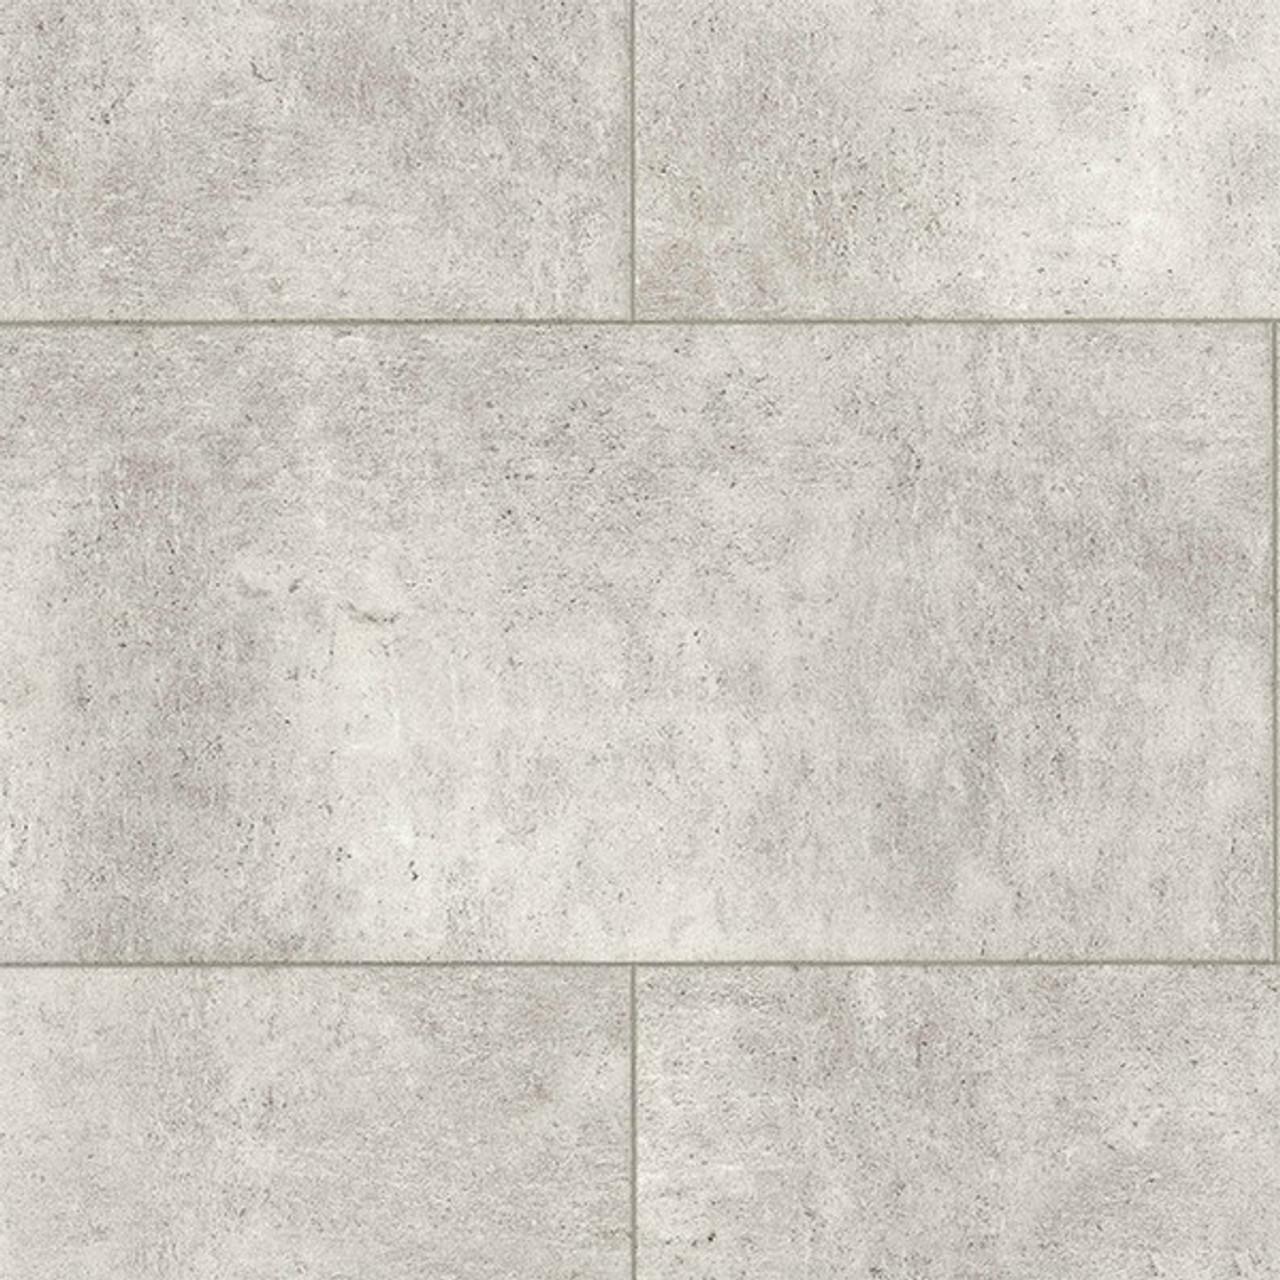 Yellow Stone | Waterproof Rigid LVP | M-Series | [20.03 SF / Box]